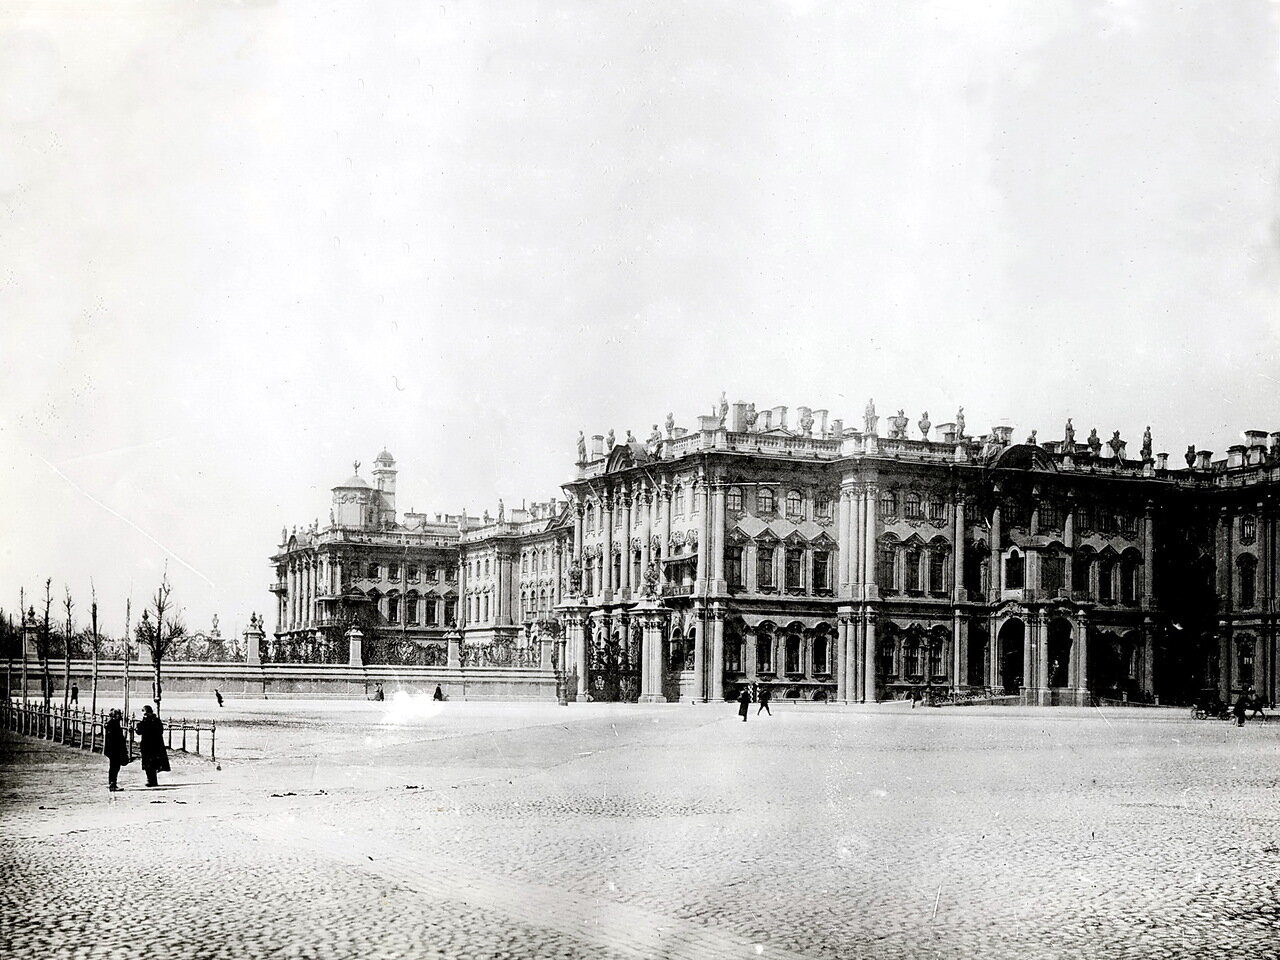 Зимний дворец. Собственный сад 1896 г.